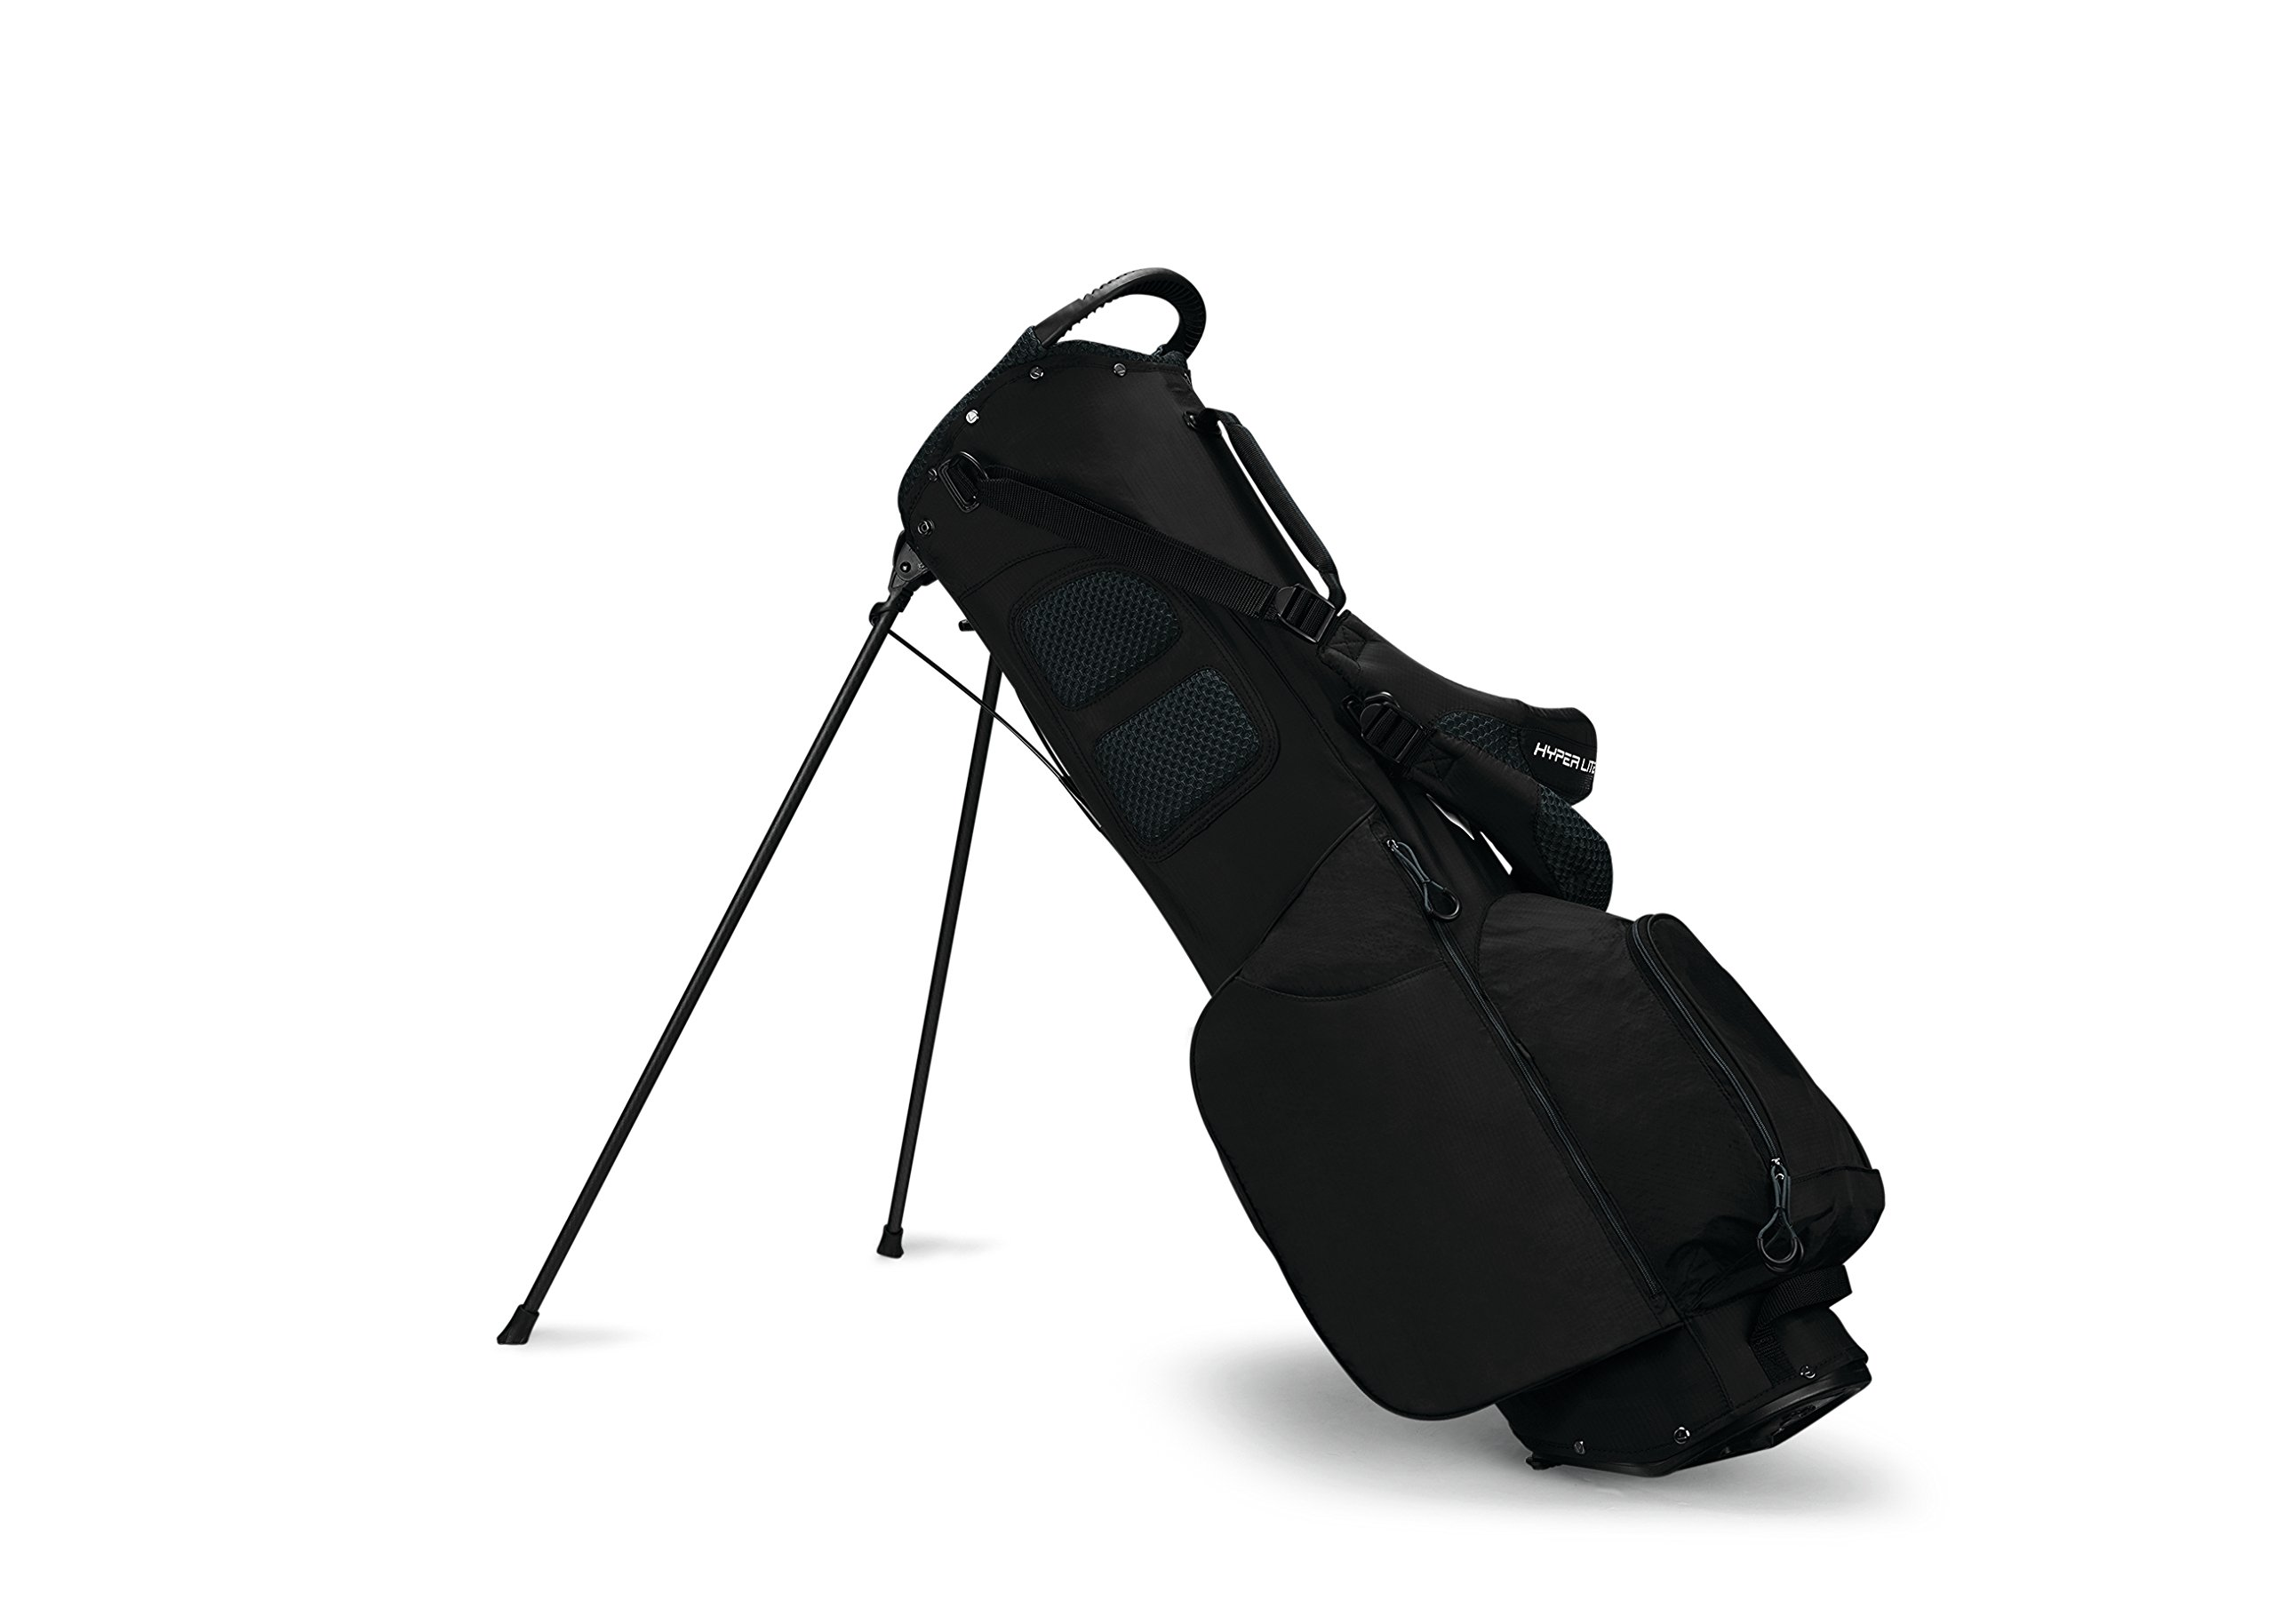 Callaway Hyper Lite Zero Golf Bags, Black by Callaway (Image #2)